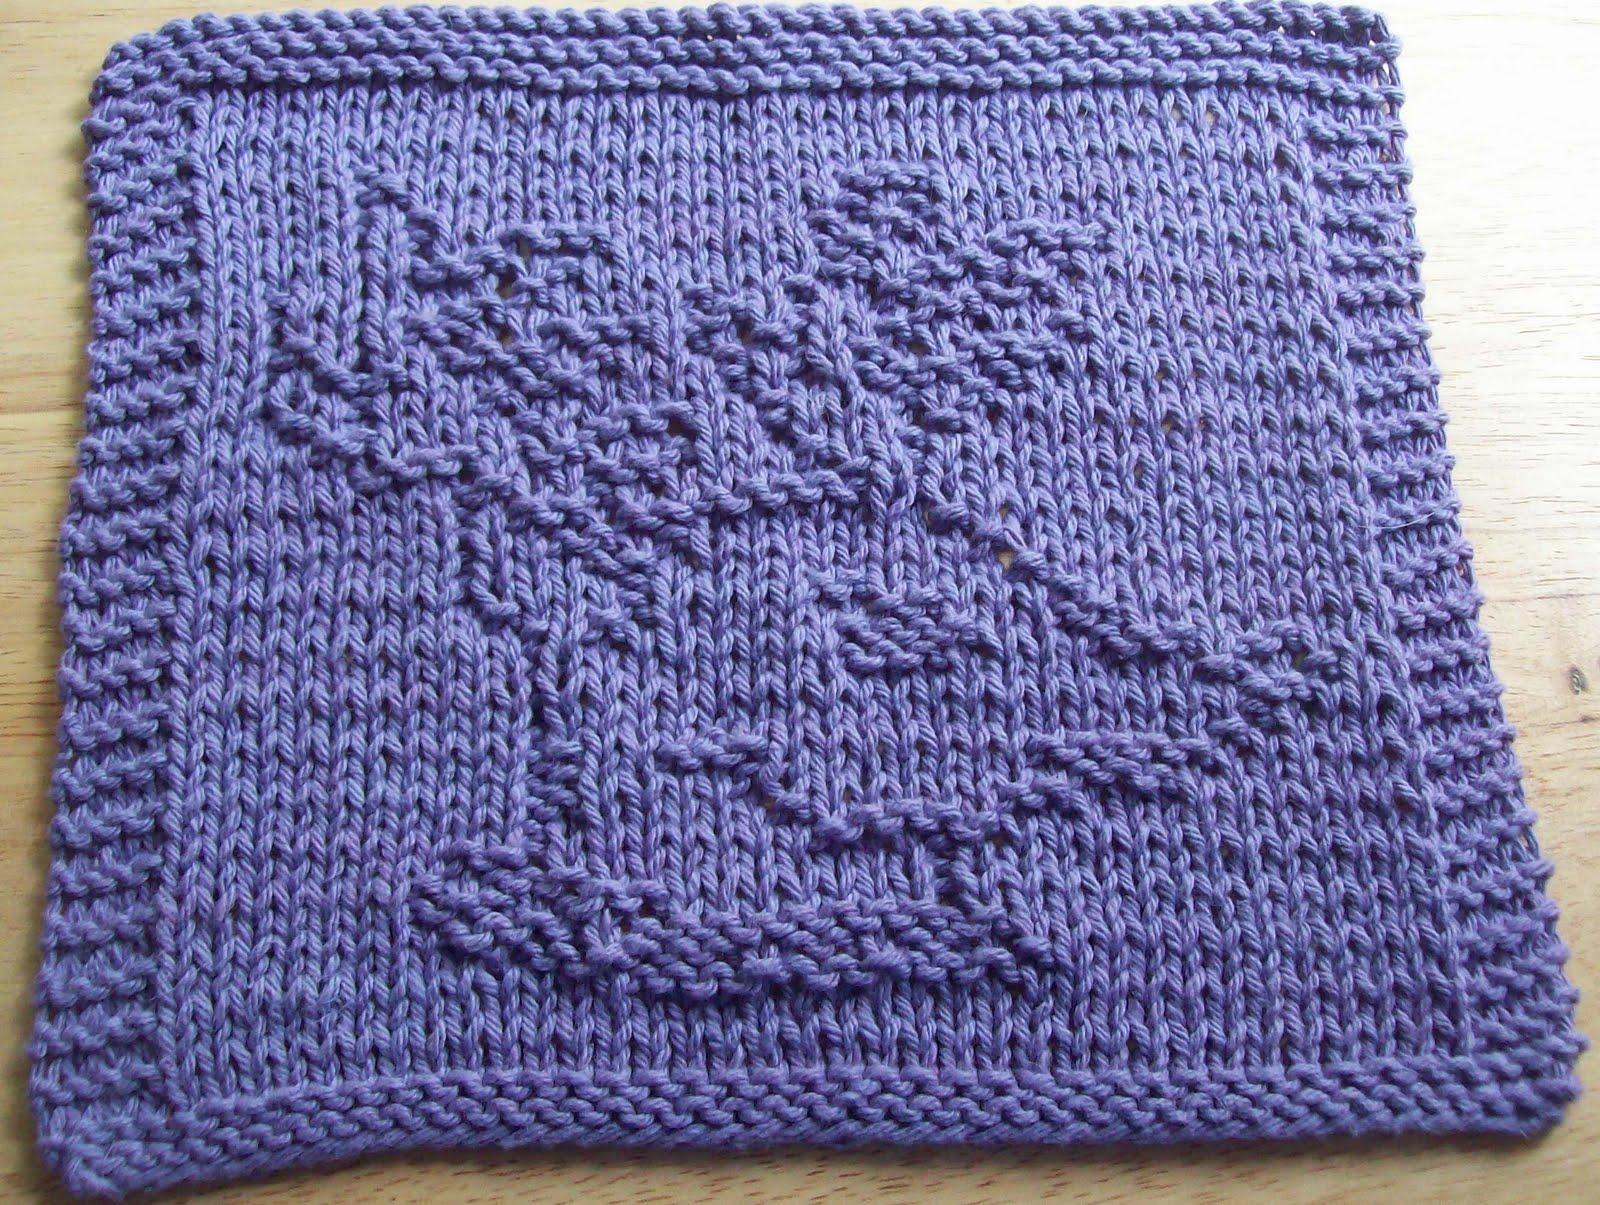 DigKnitty Designs: Reindeer Face Knit Dishcloth Pattern